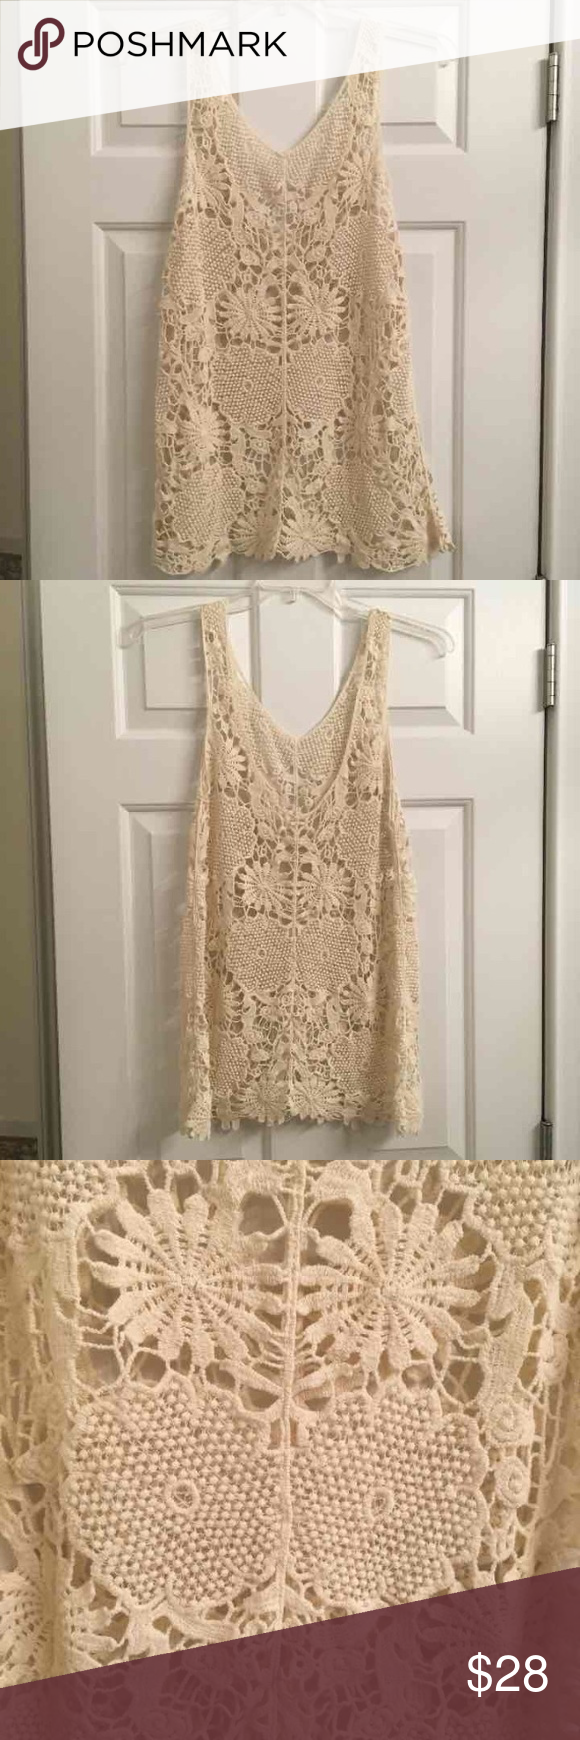 Lace dress cover up  Brandy Melville Crochet Lace Cover Up  Brandy melville Crochet